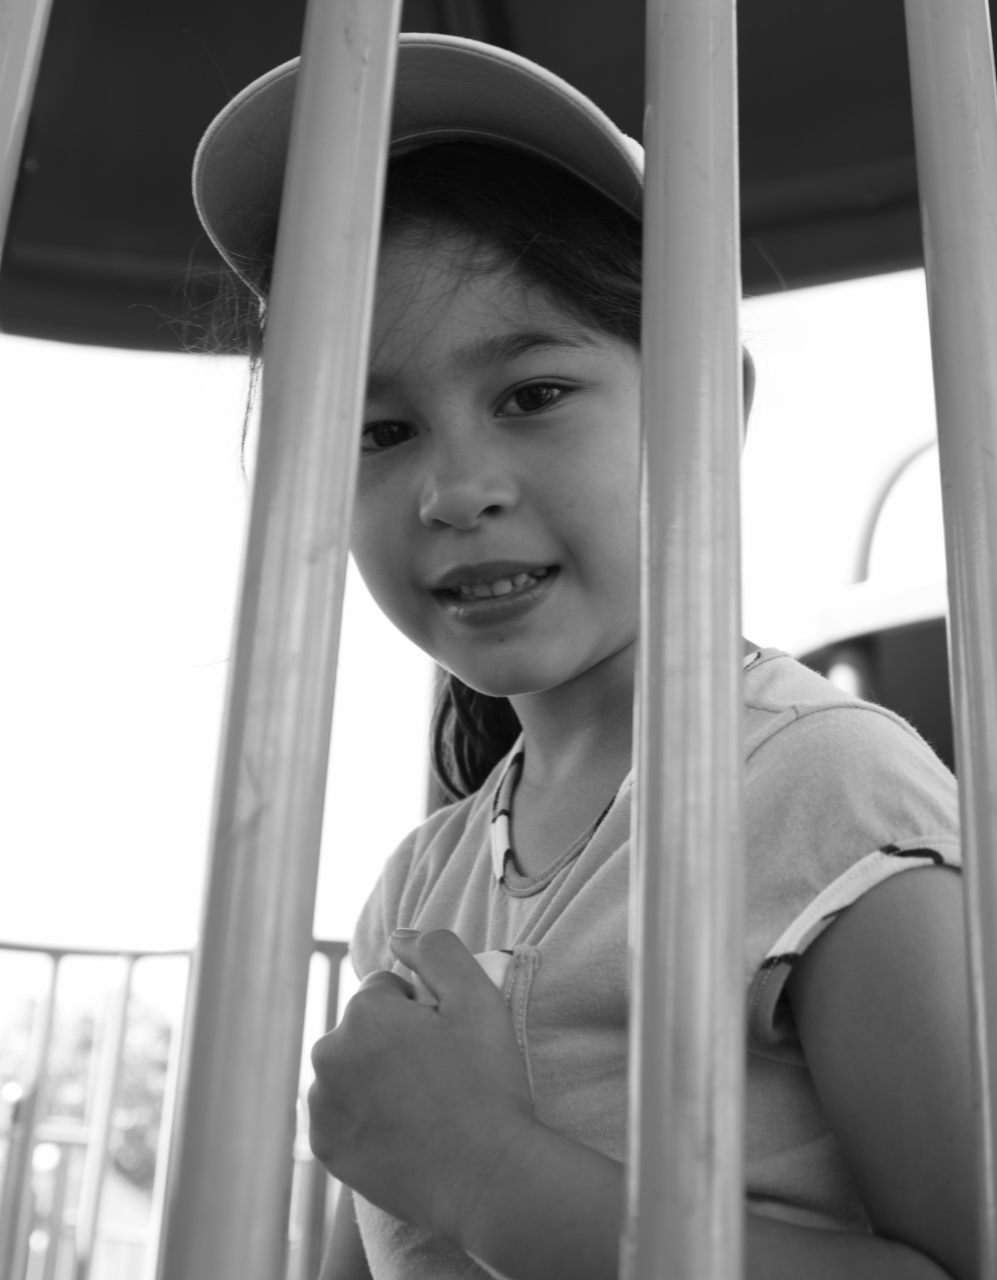 Scarlett at the Park